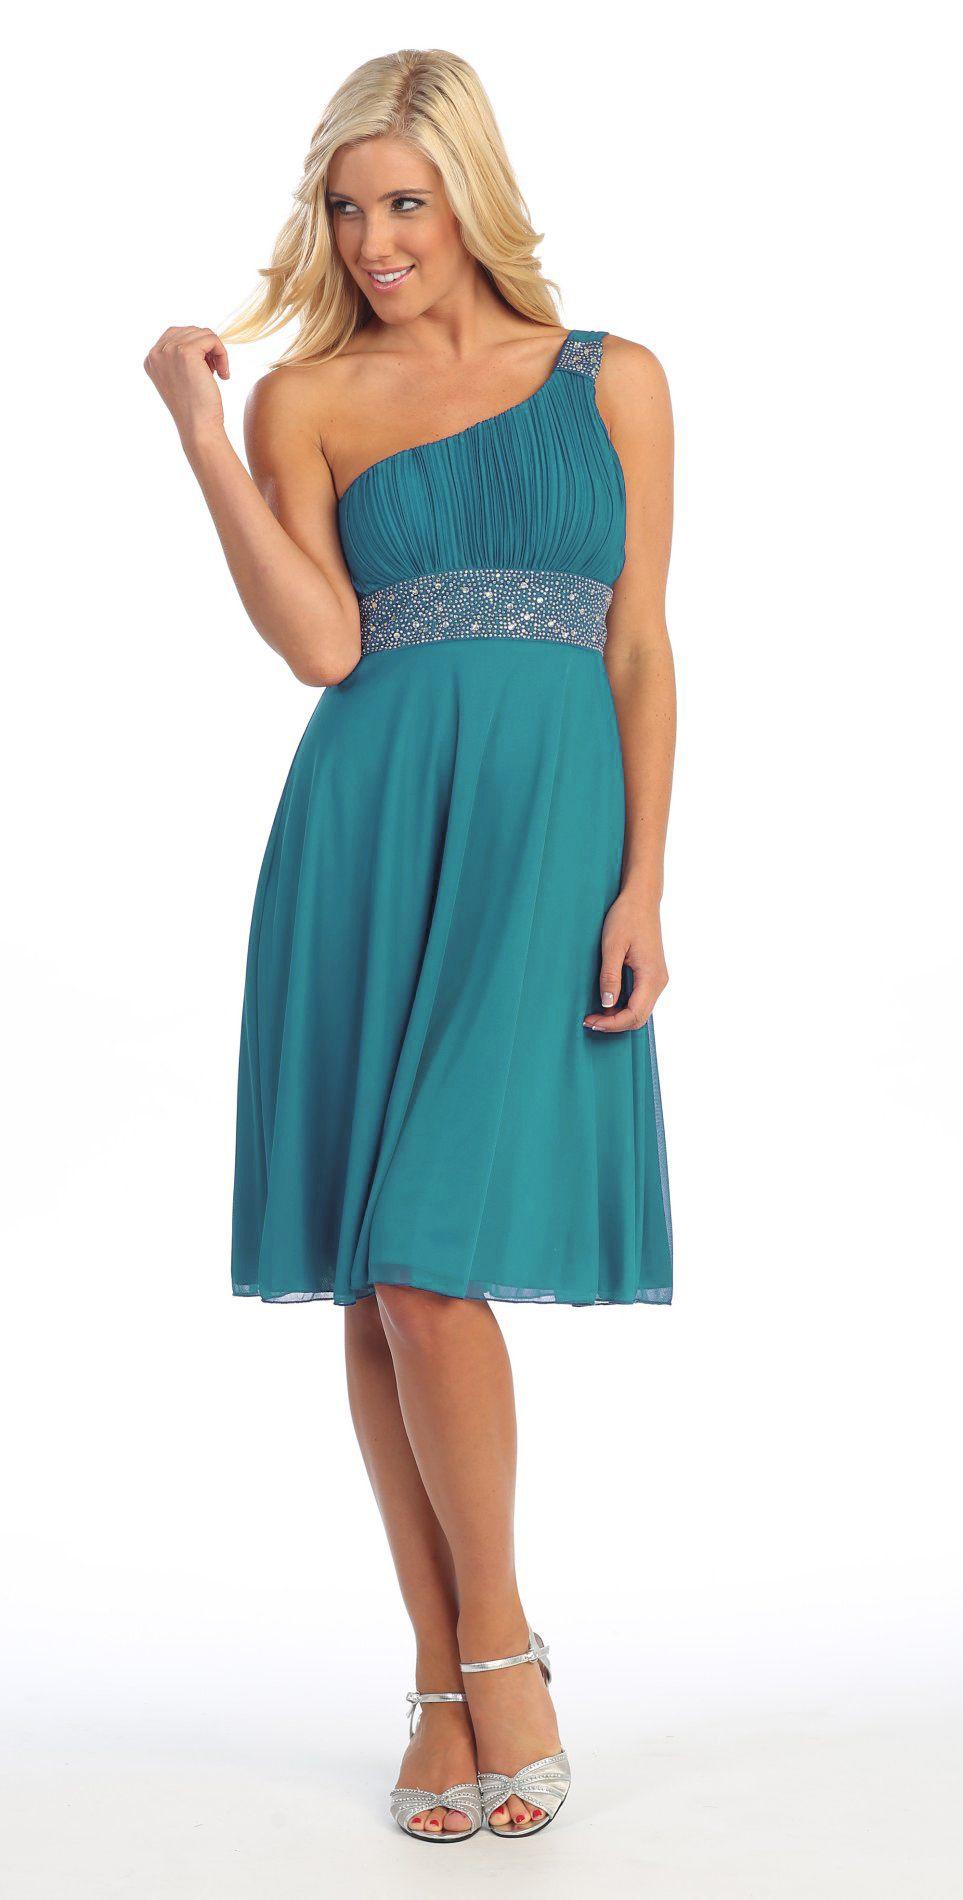 Green dress for wedding  Teal Knee Length Cruise Dress chiffon One Shoulder WJacket